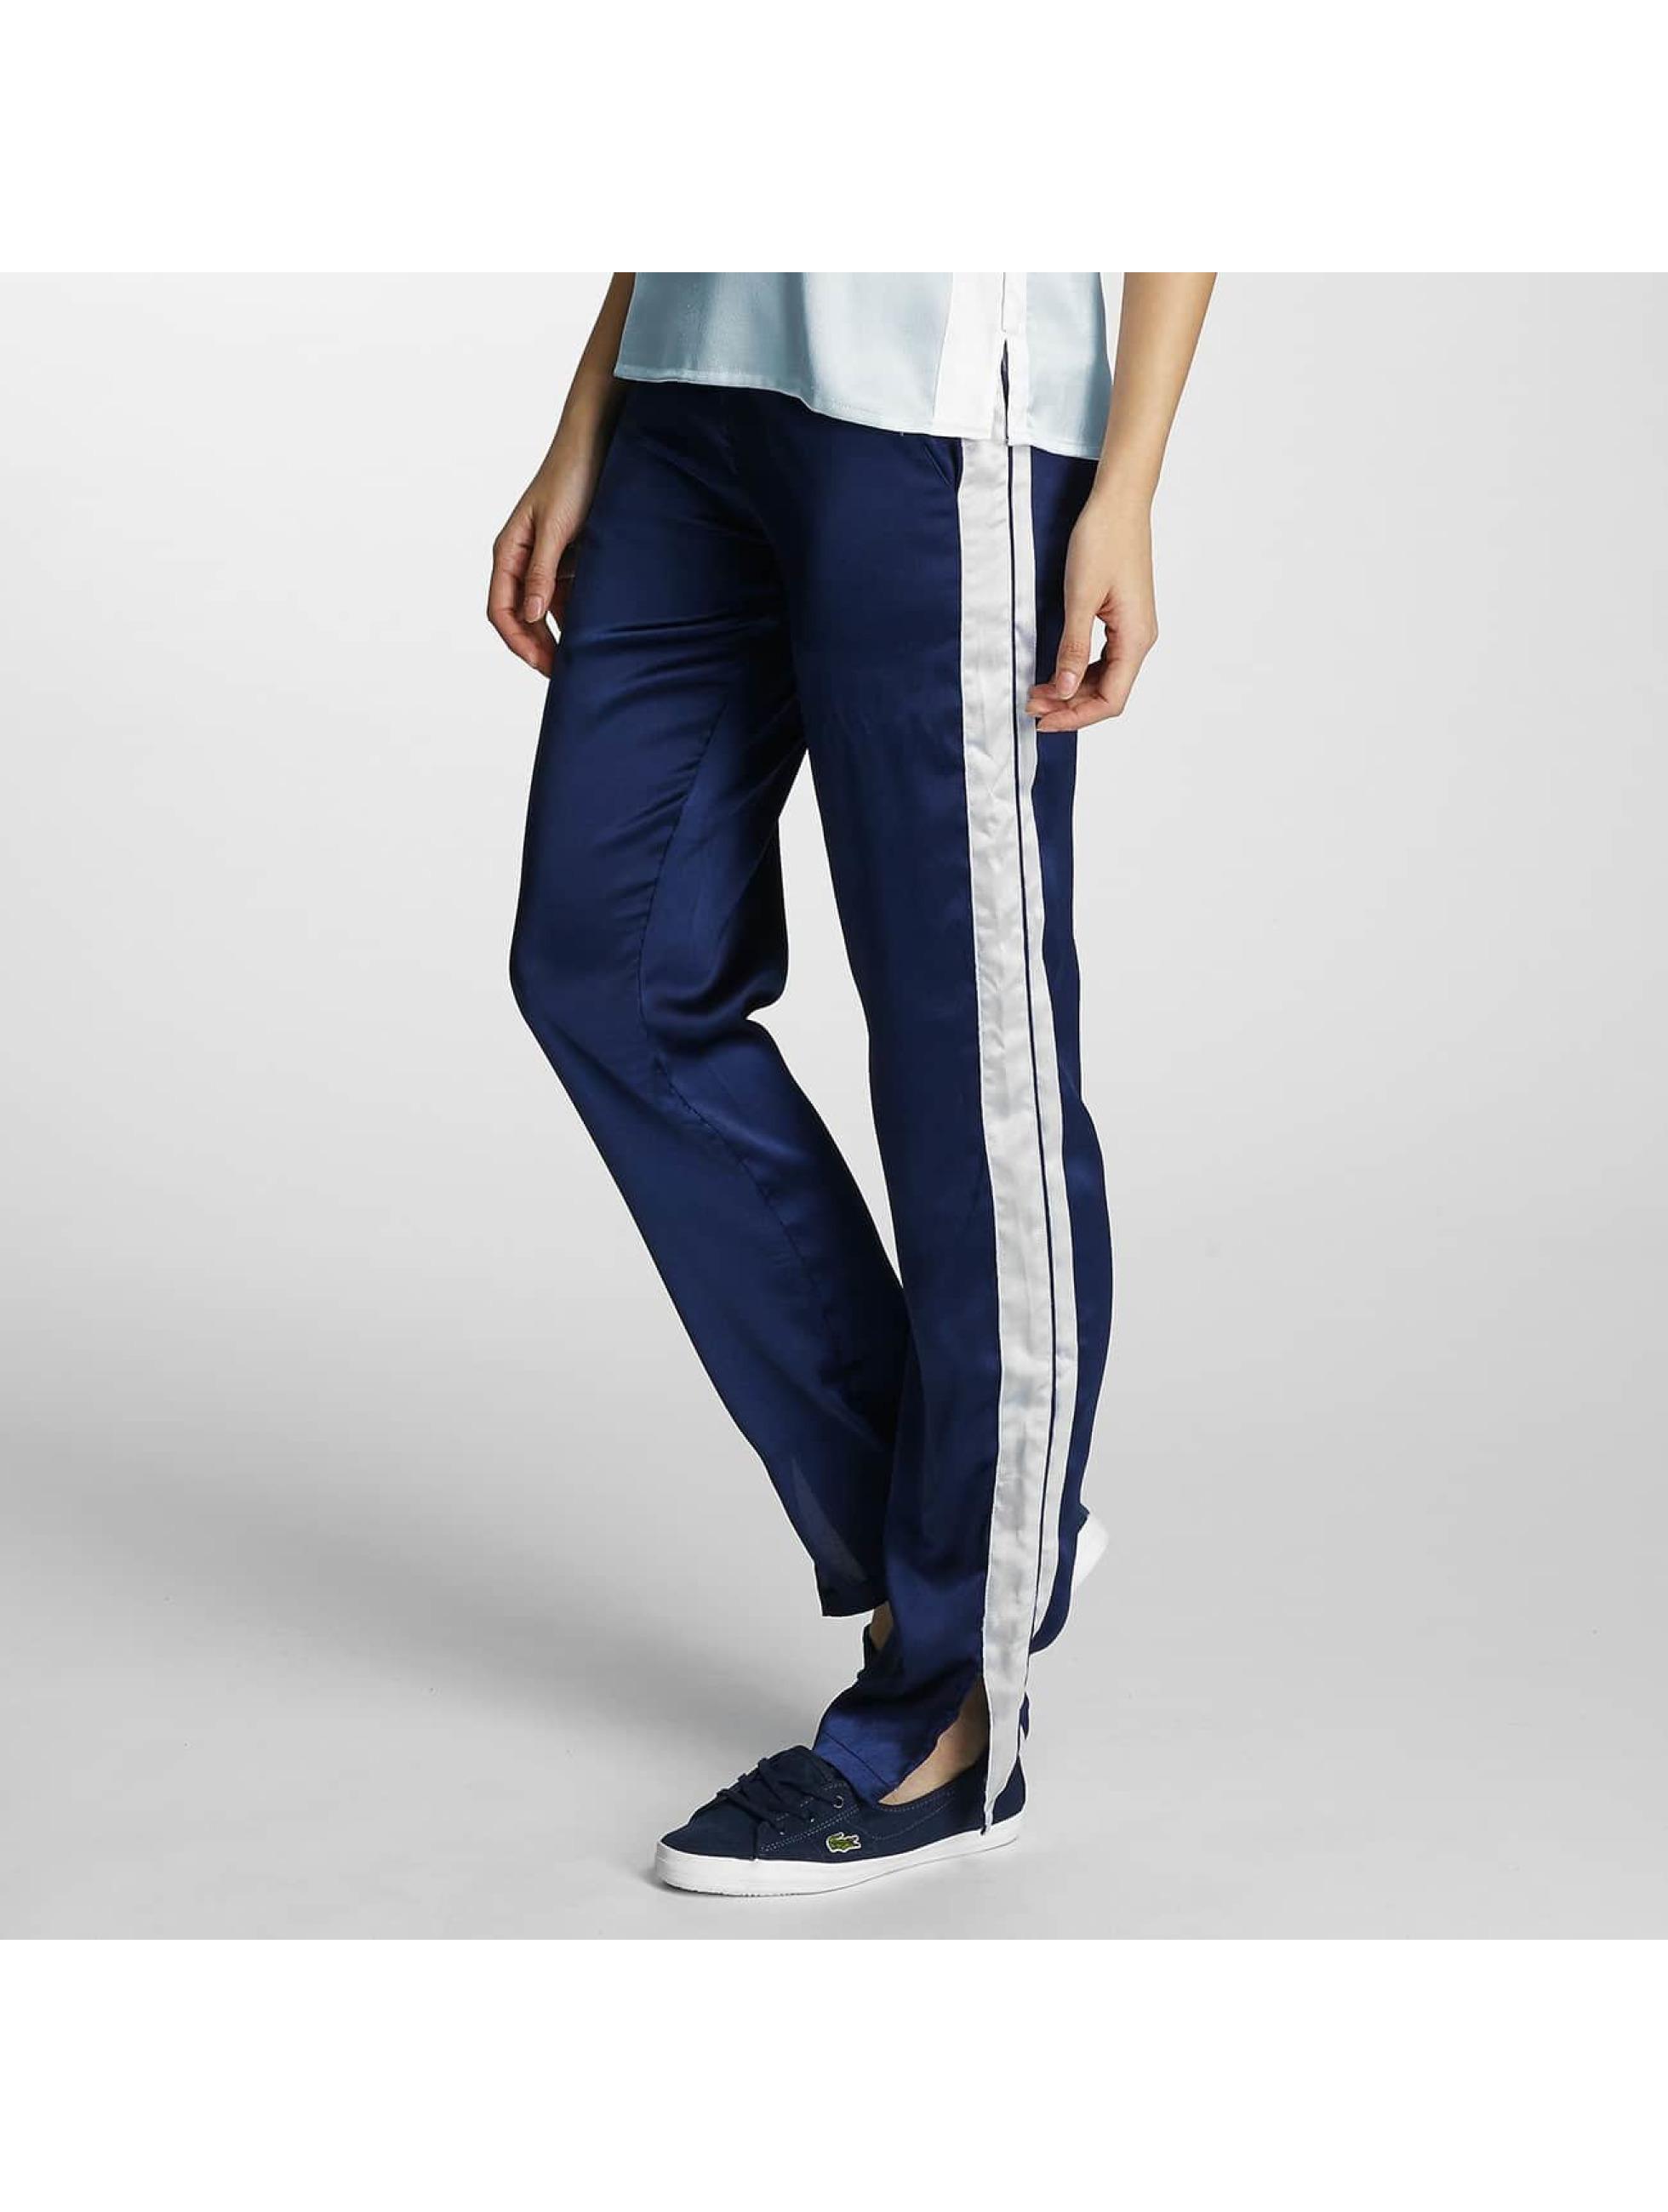 Pieces Pantalon / Chino pcEVE en bleu